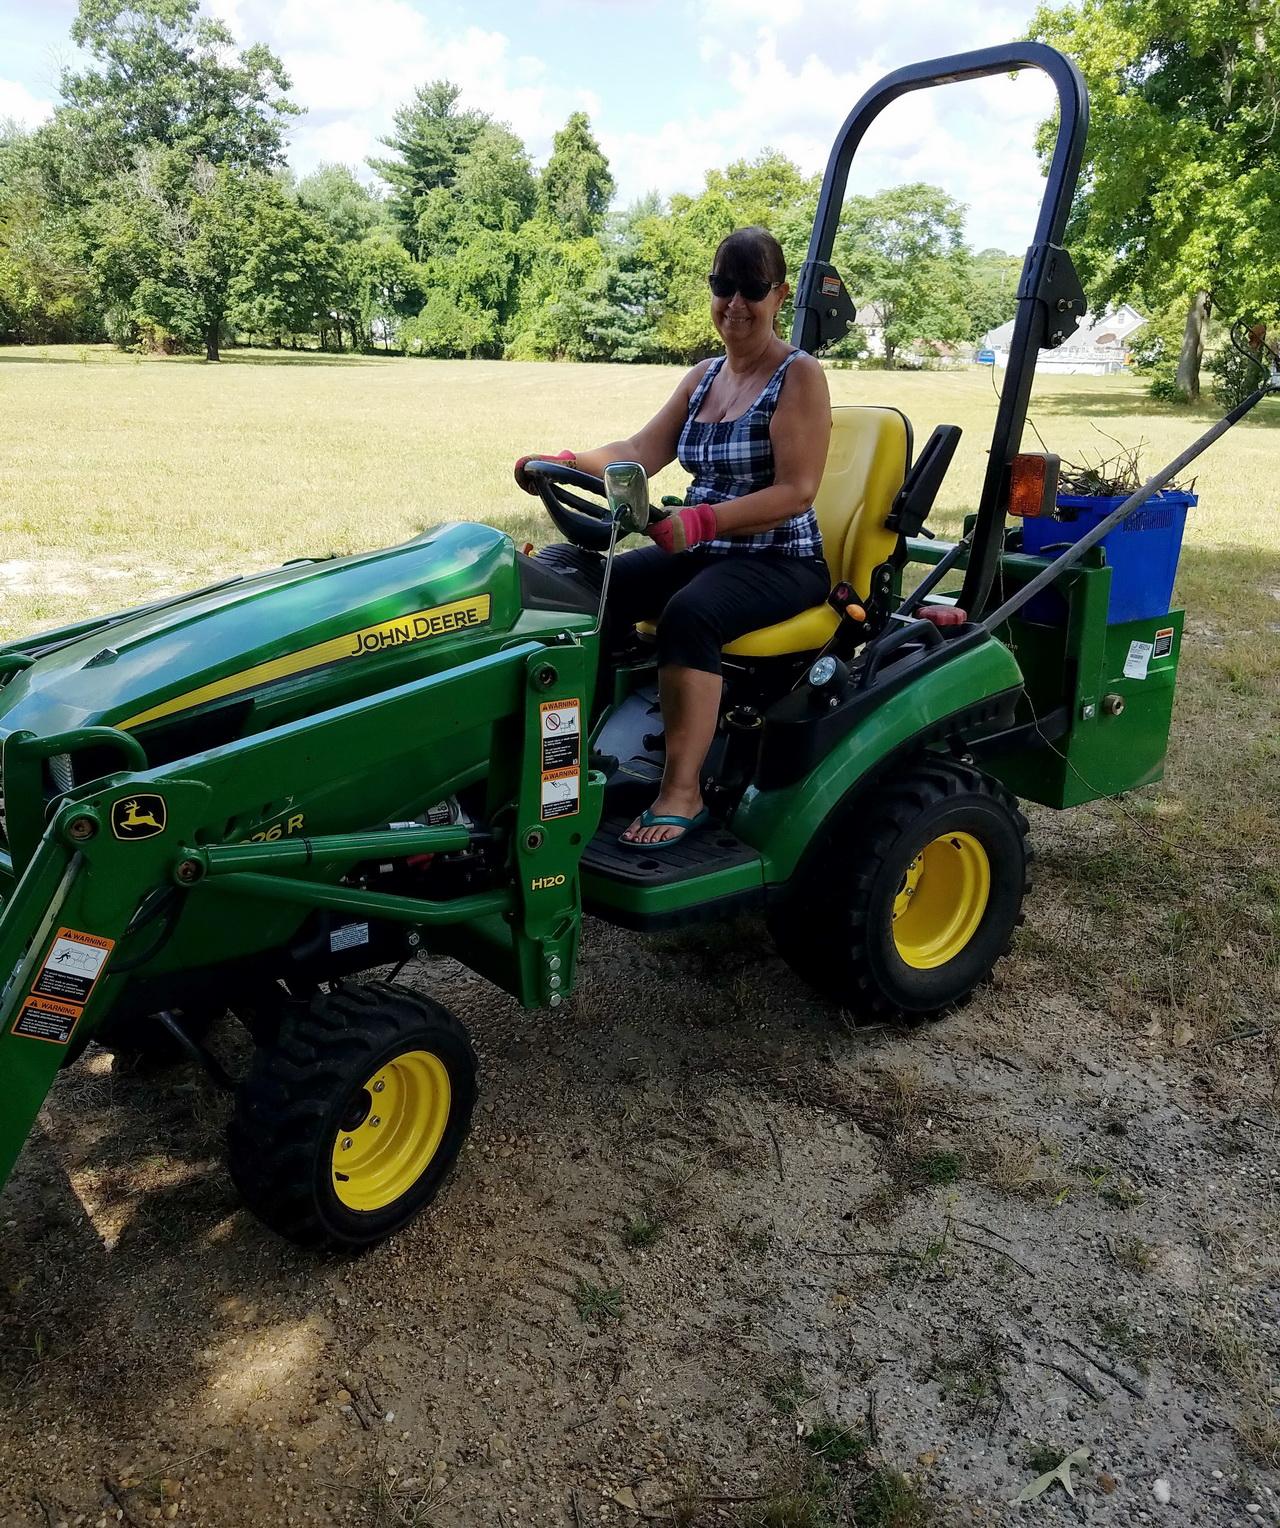 carla on tractor1.jpg